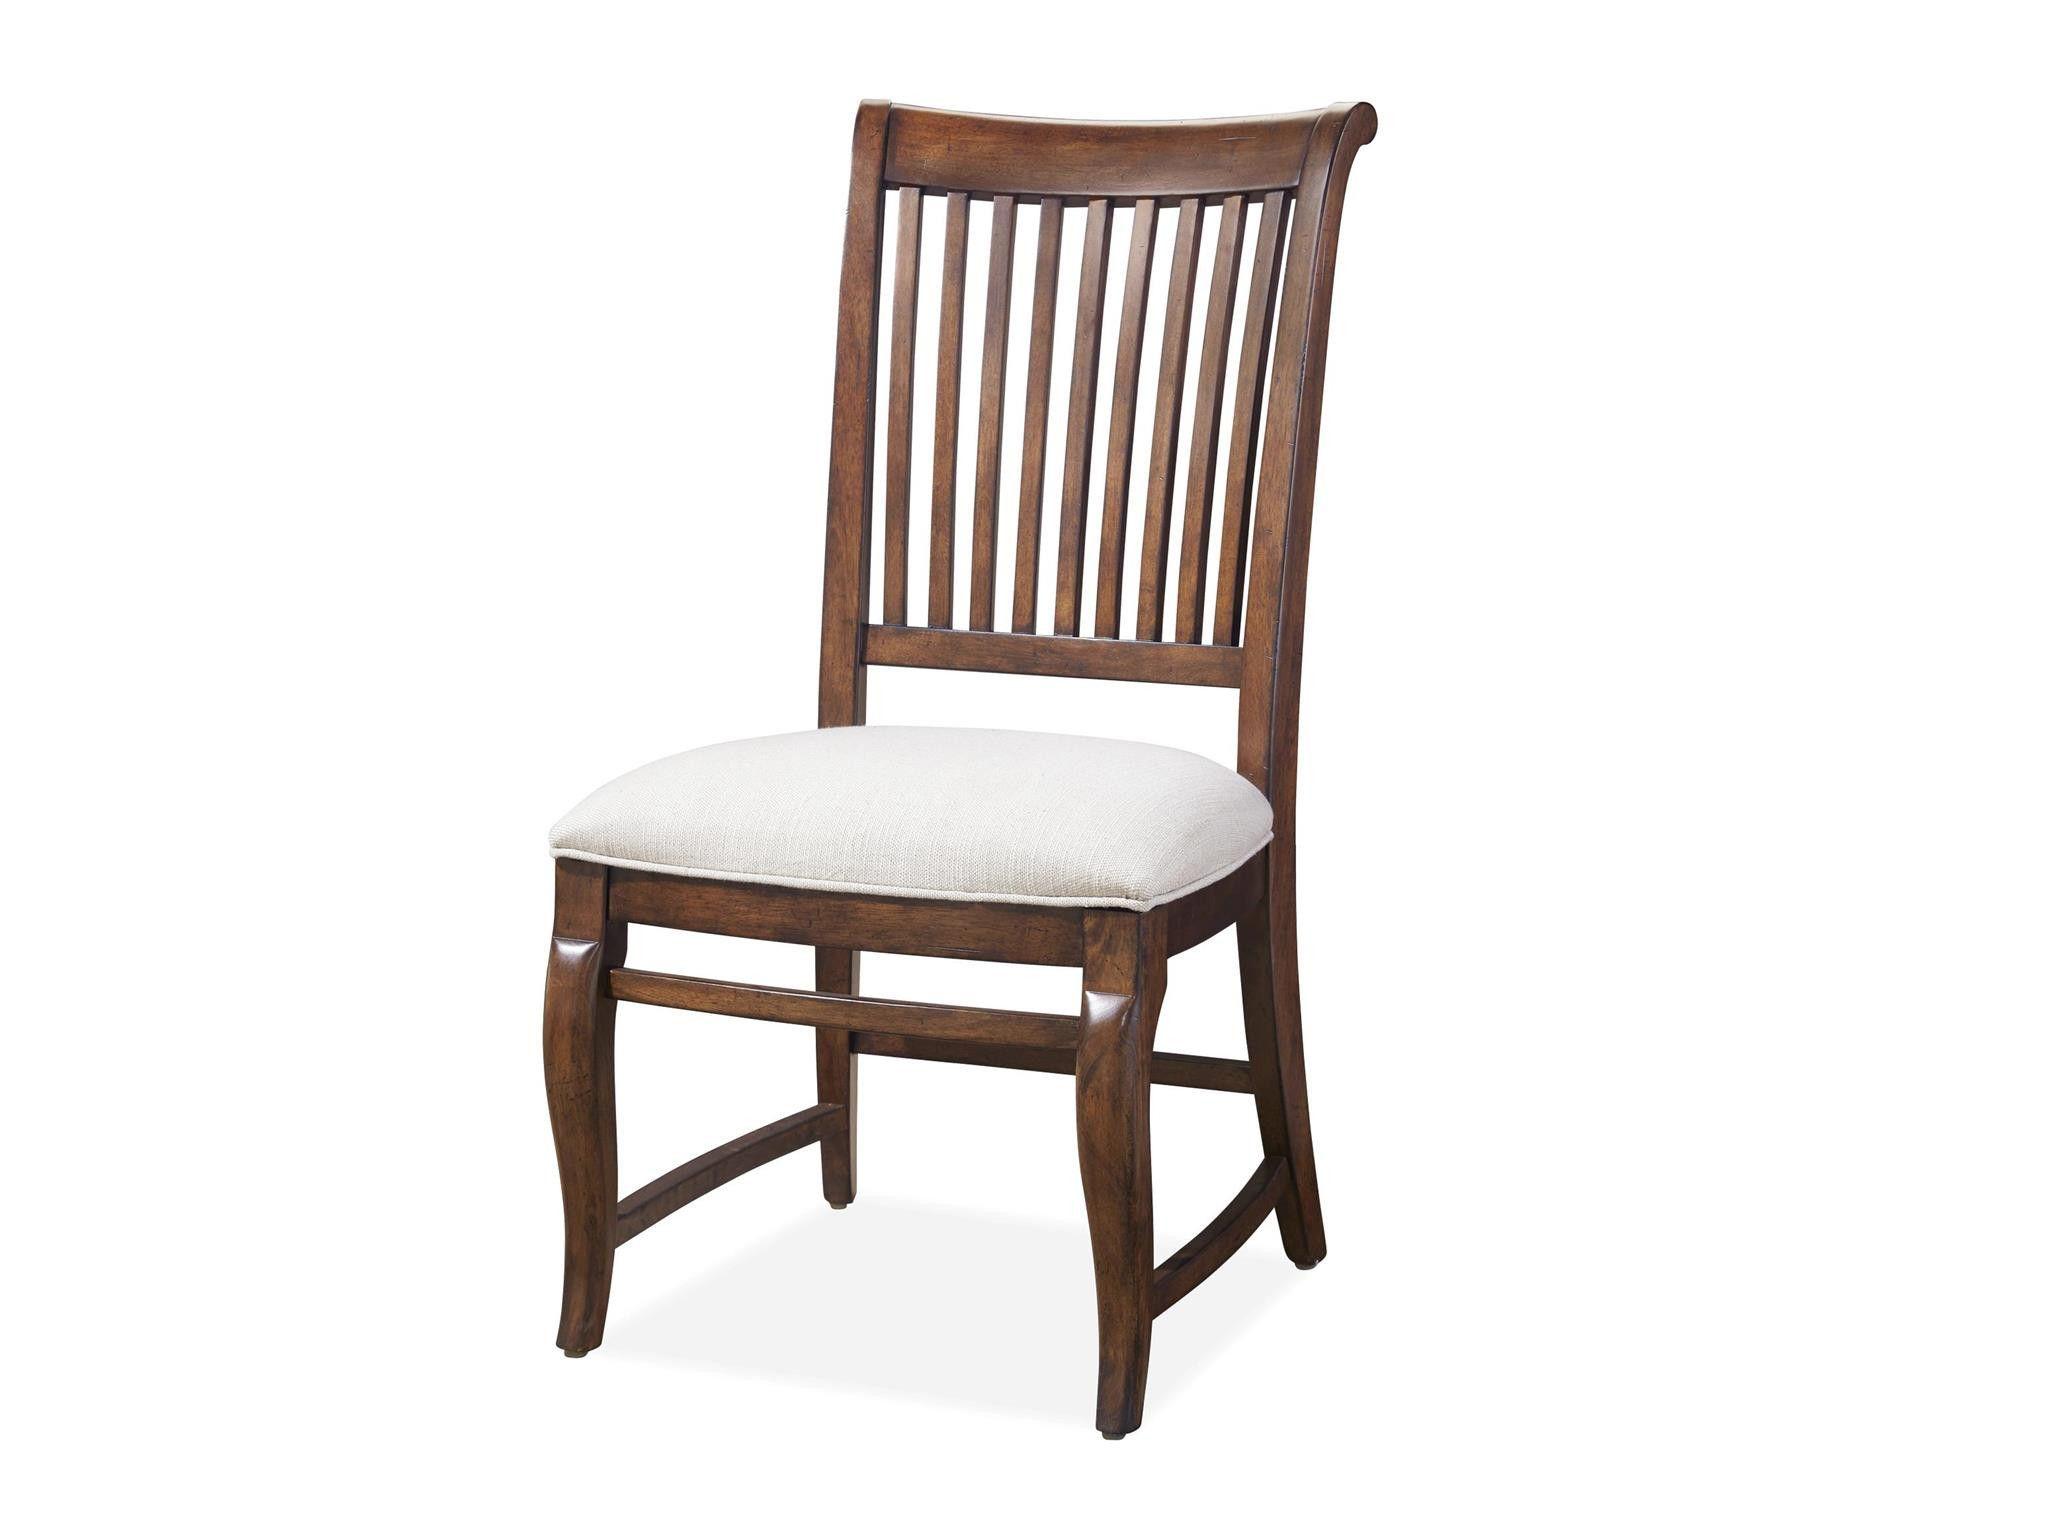 Paula Deen Dogwood Side Chair (Set of 2) - Low Tide Finish